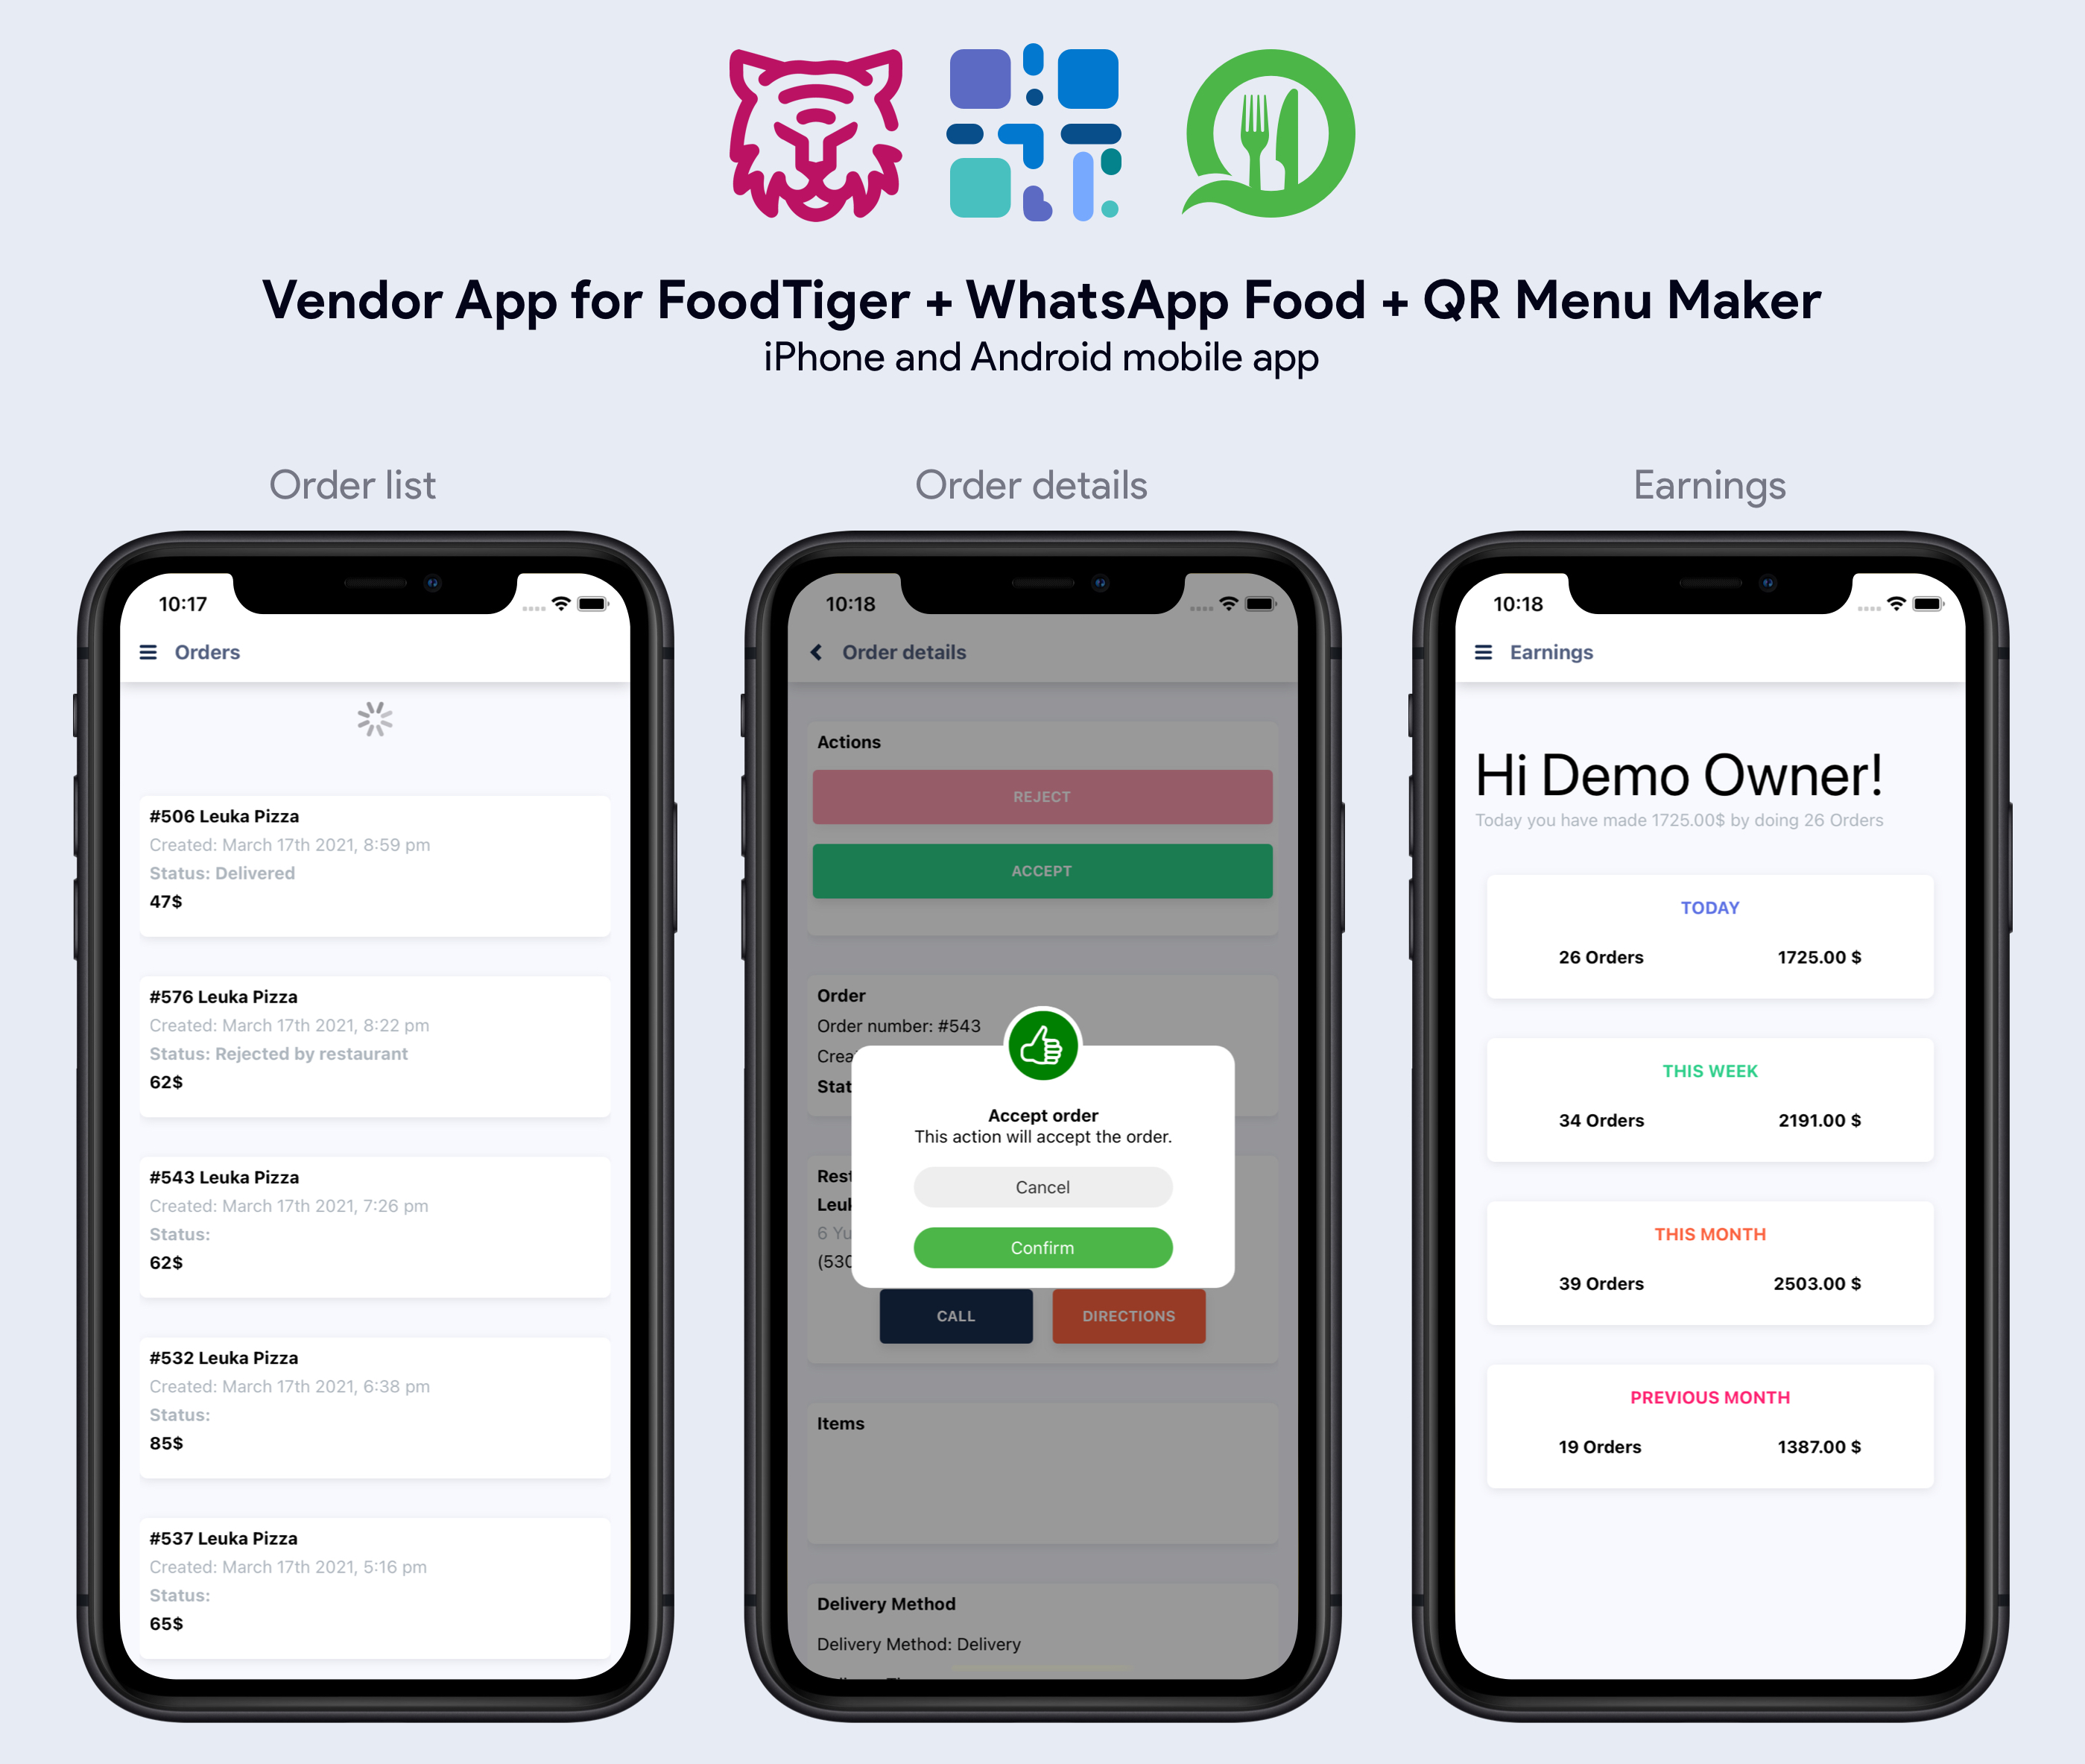 Application du fournisseur - WhatsApp Food, FoodTiger, QR Menu Maker - 5